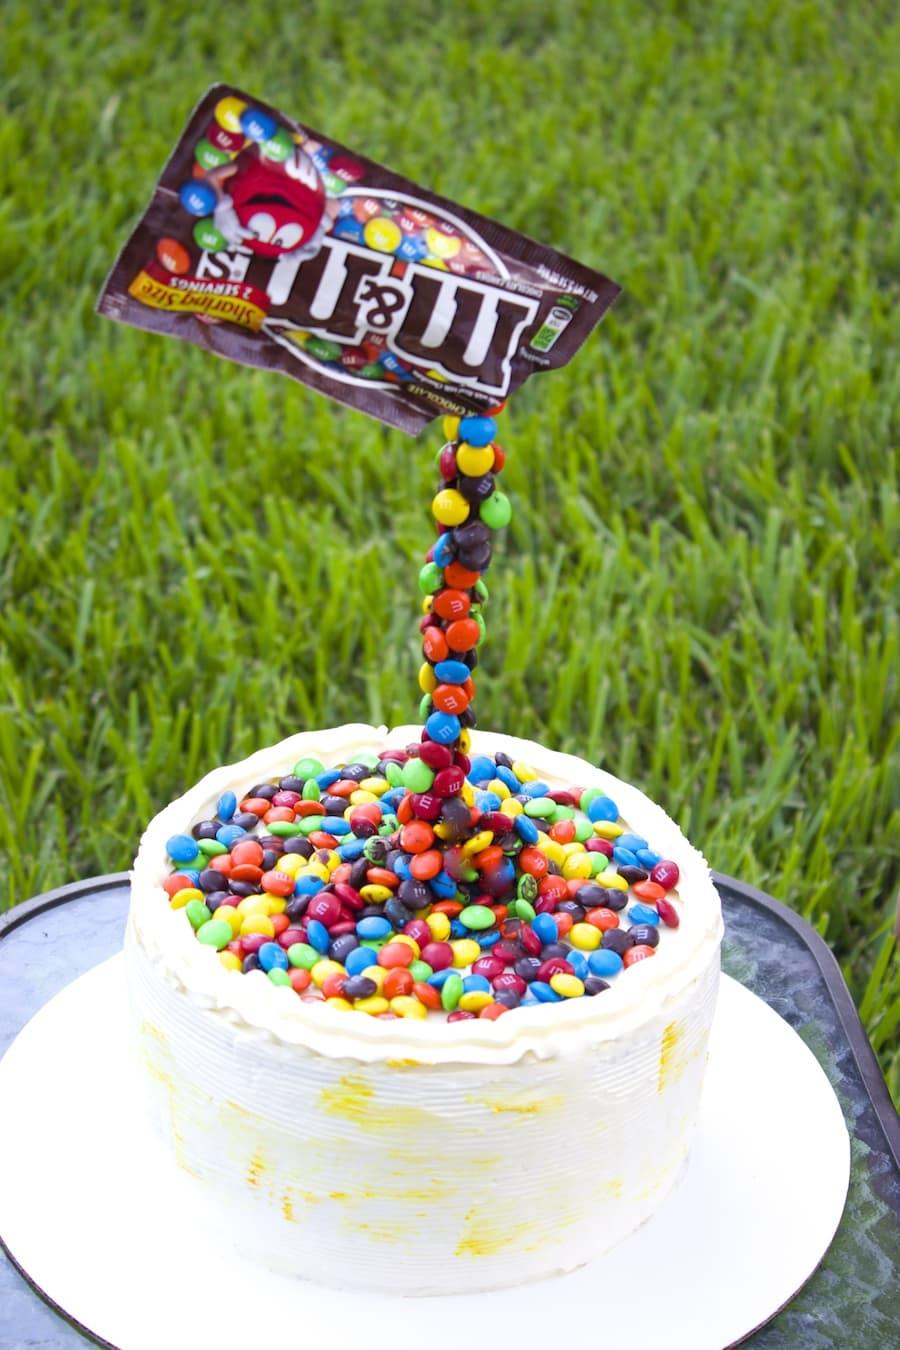 Illusion Cake Gravity Defying Cake Swiss Meringue Buttercream Frosting